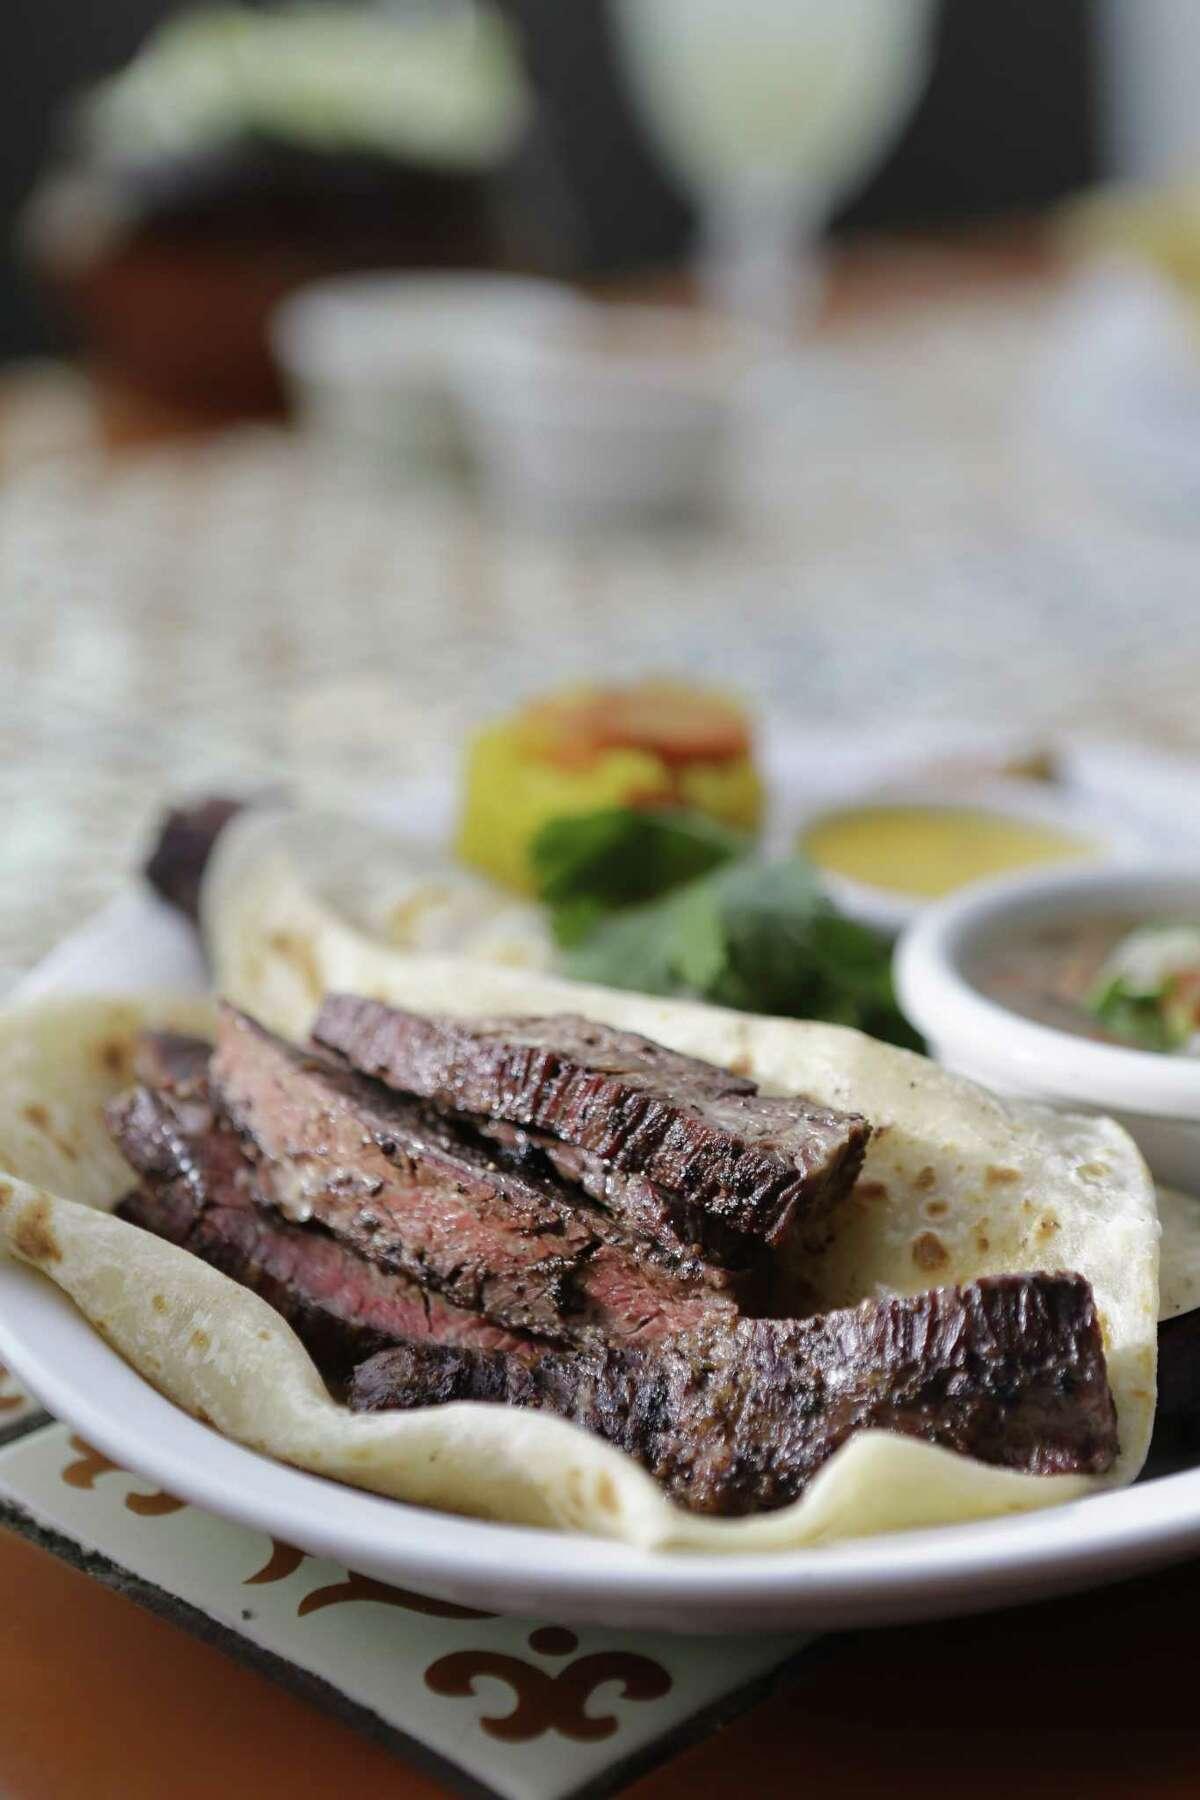 Tacos al carbon from the Original Ninfa's on Navigation.